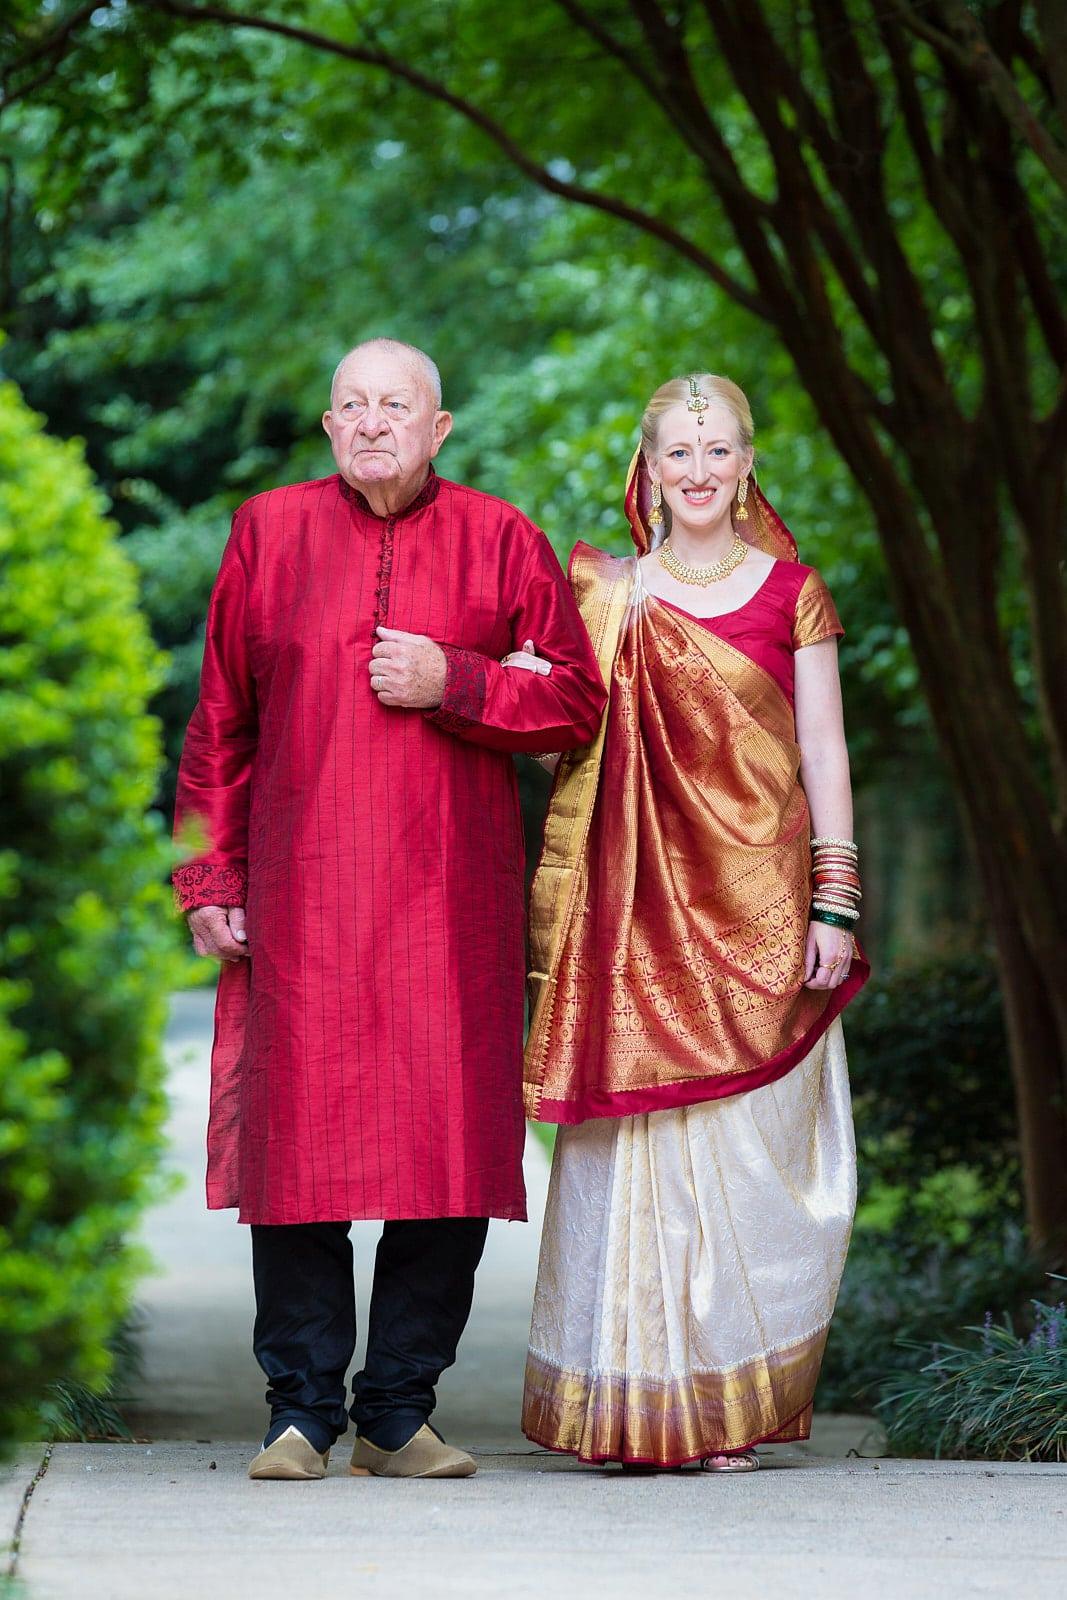 dads walks daughter down aisle for Atlanta wedding ceremony